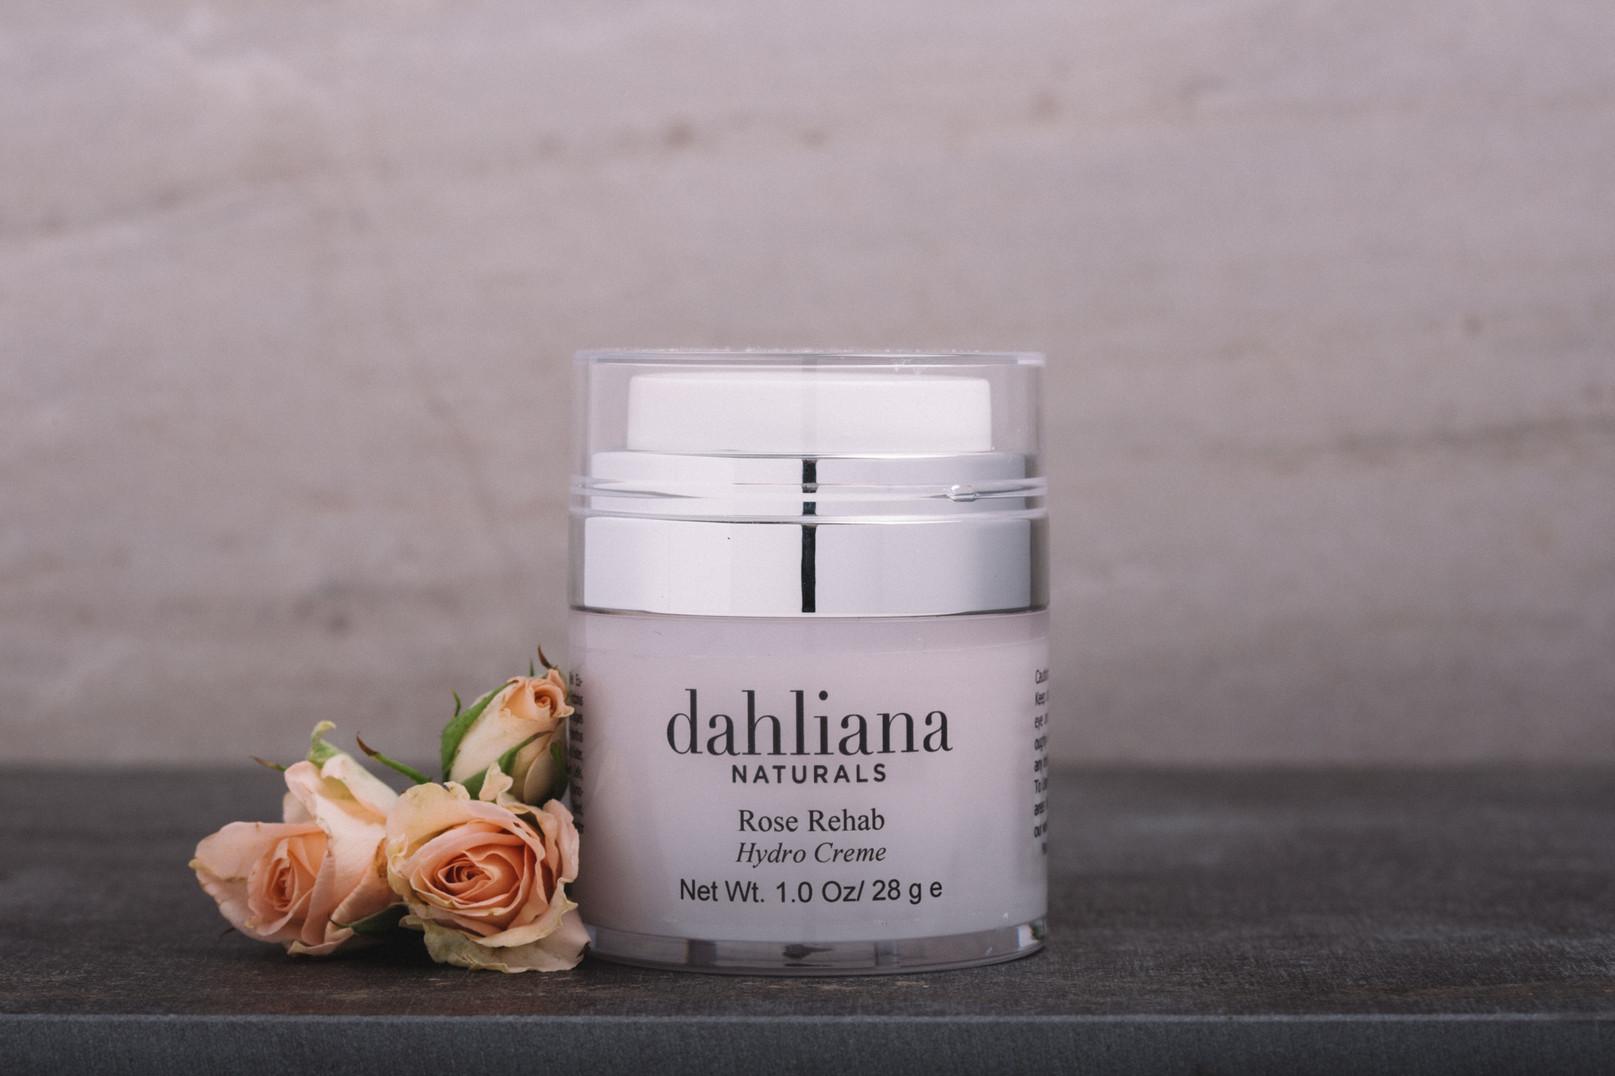 Dahliana Skin Care Ingrid Nelson Photographer Nevada City